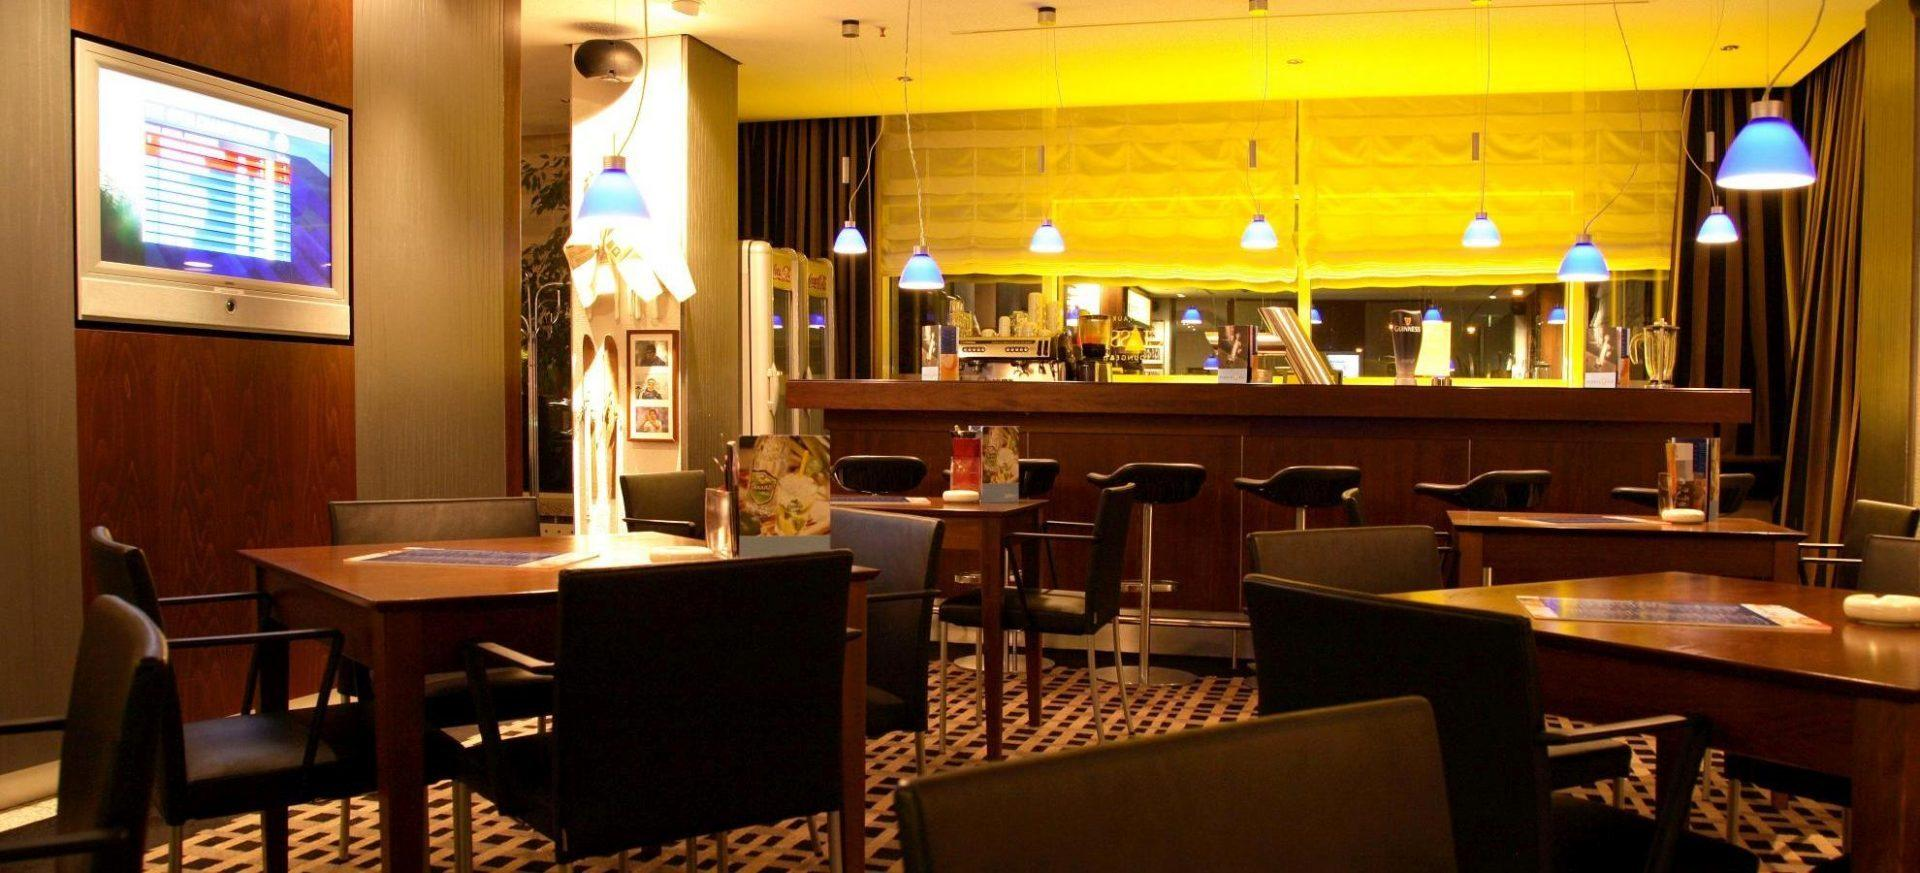 Radisson Blu Hotel Erfurt Sportsbar